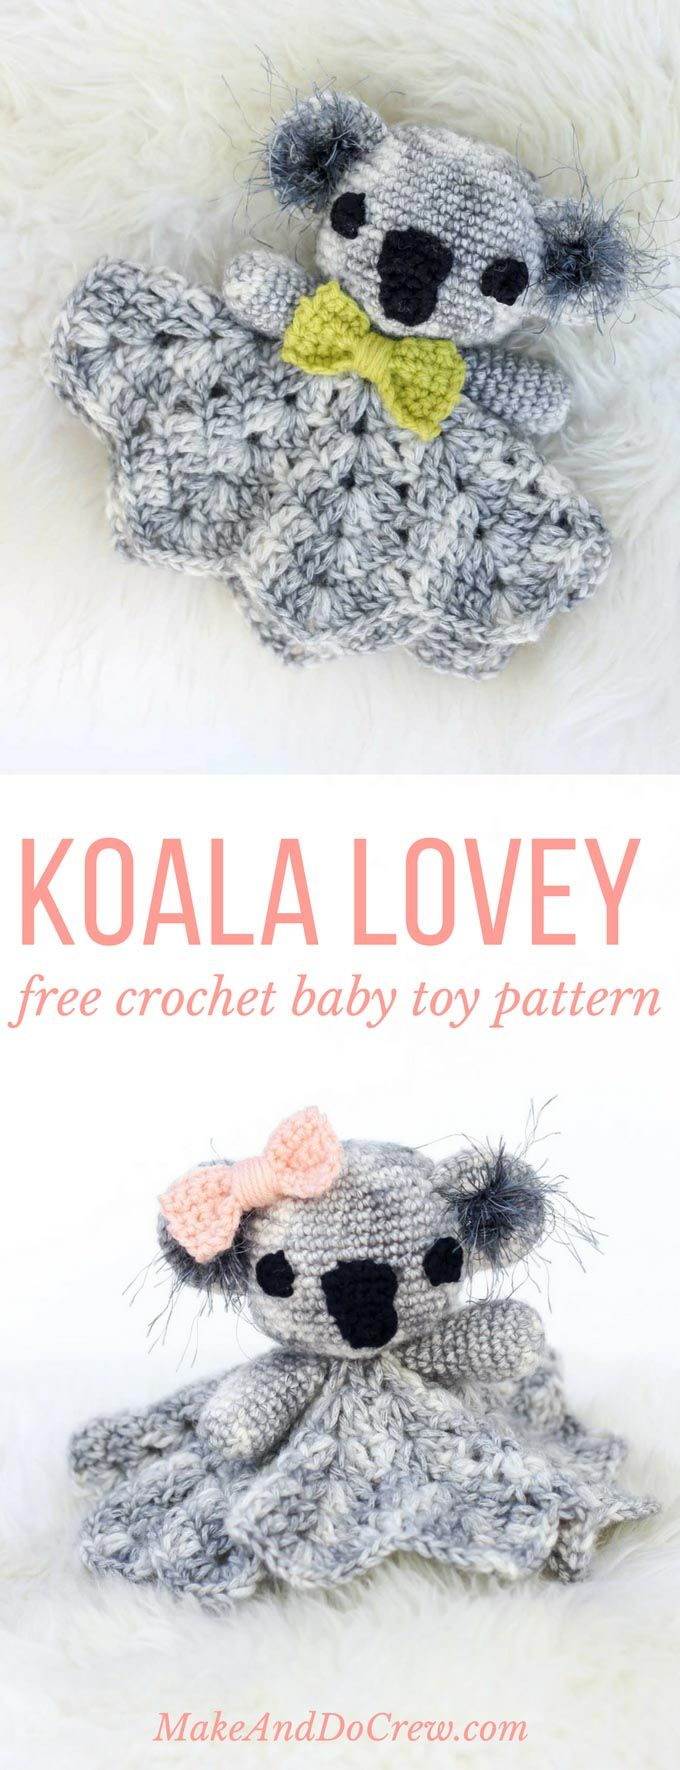 Cuddly Koala - Free Crochet Lovey Pattern | Manta, Tejido y Ganchillo